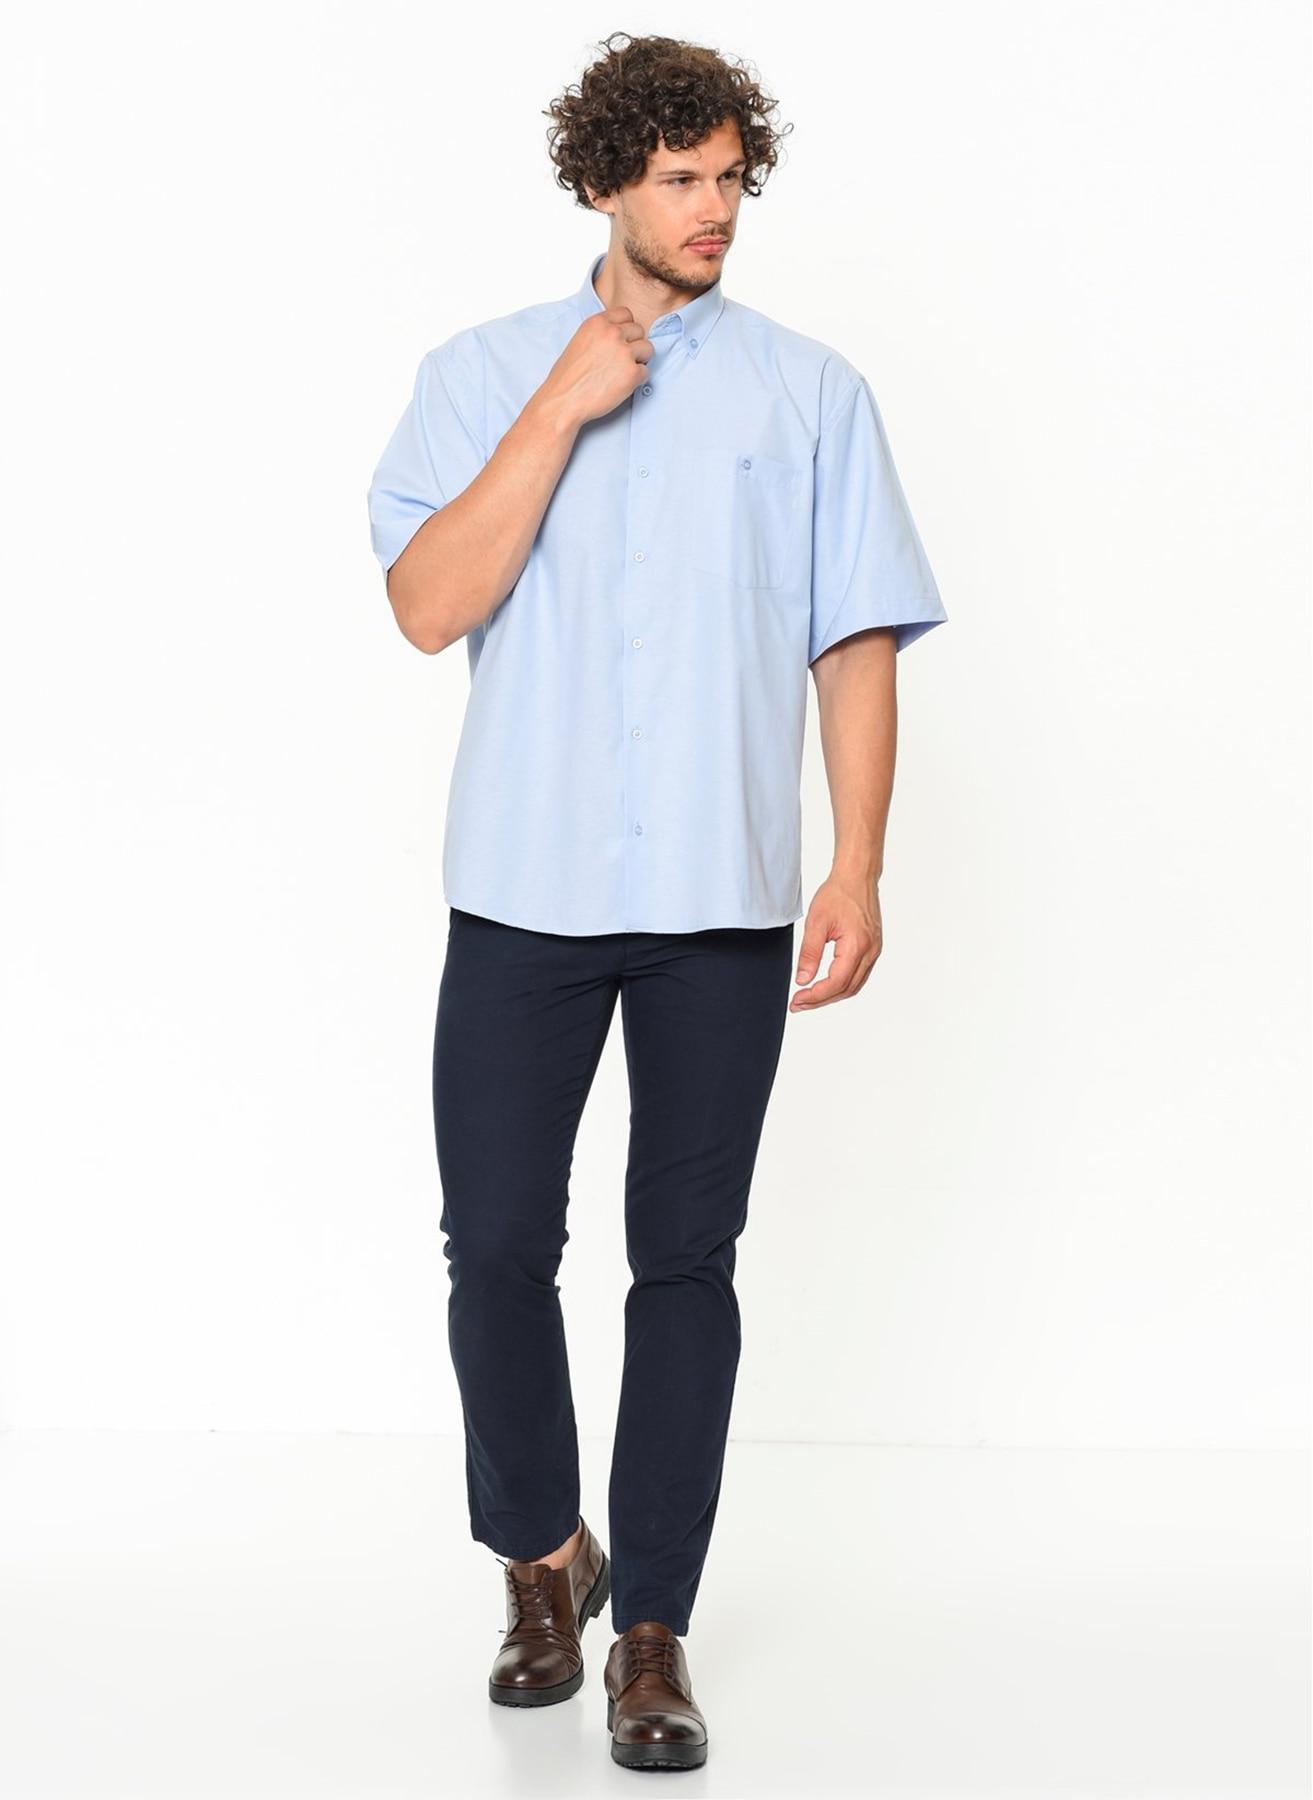 Varetta Plus Size Blue 8XL 3XL Formal Dresses Big Size Men Oxford Business Casual Short Sleeve Classic Solid Male Social Dress Brand Shirts New Fashion Elegant Large Size Plaid Brand Clothing Camisa Masculina For Men